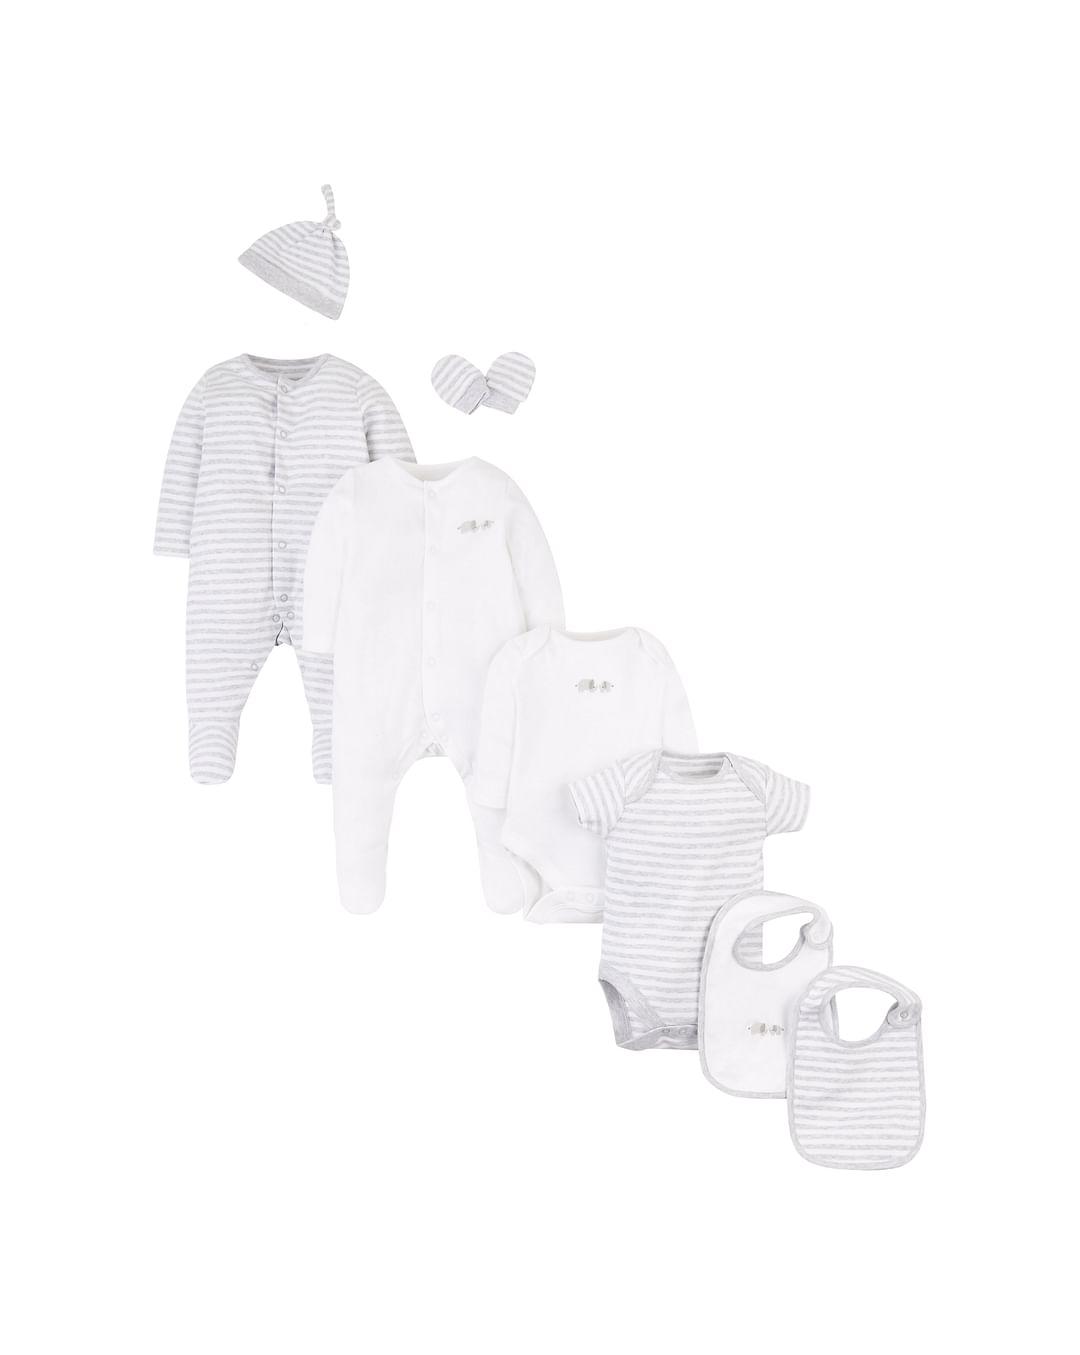 Mothercare | Unisex 8 Piece Set Stripe And Elephant Print - Grey White